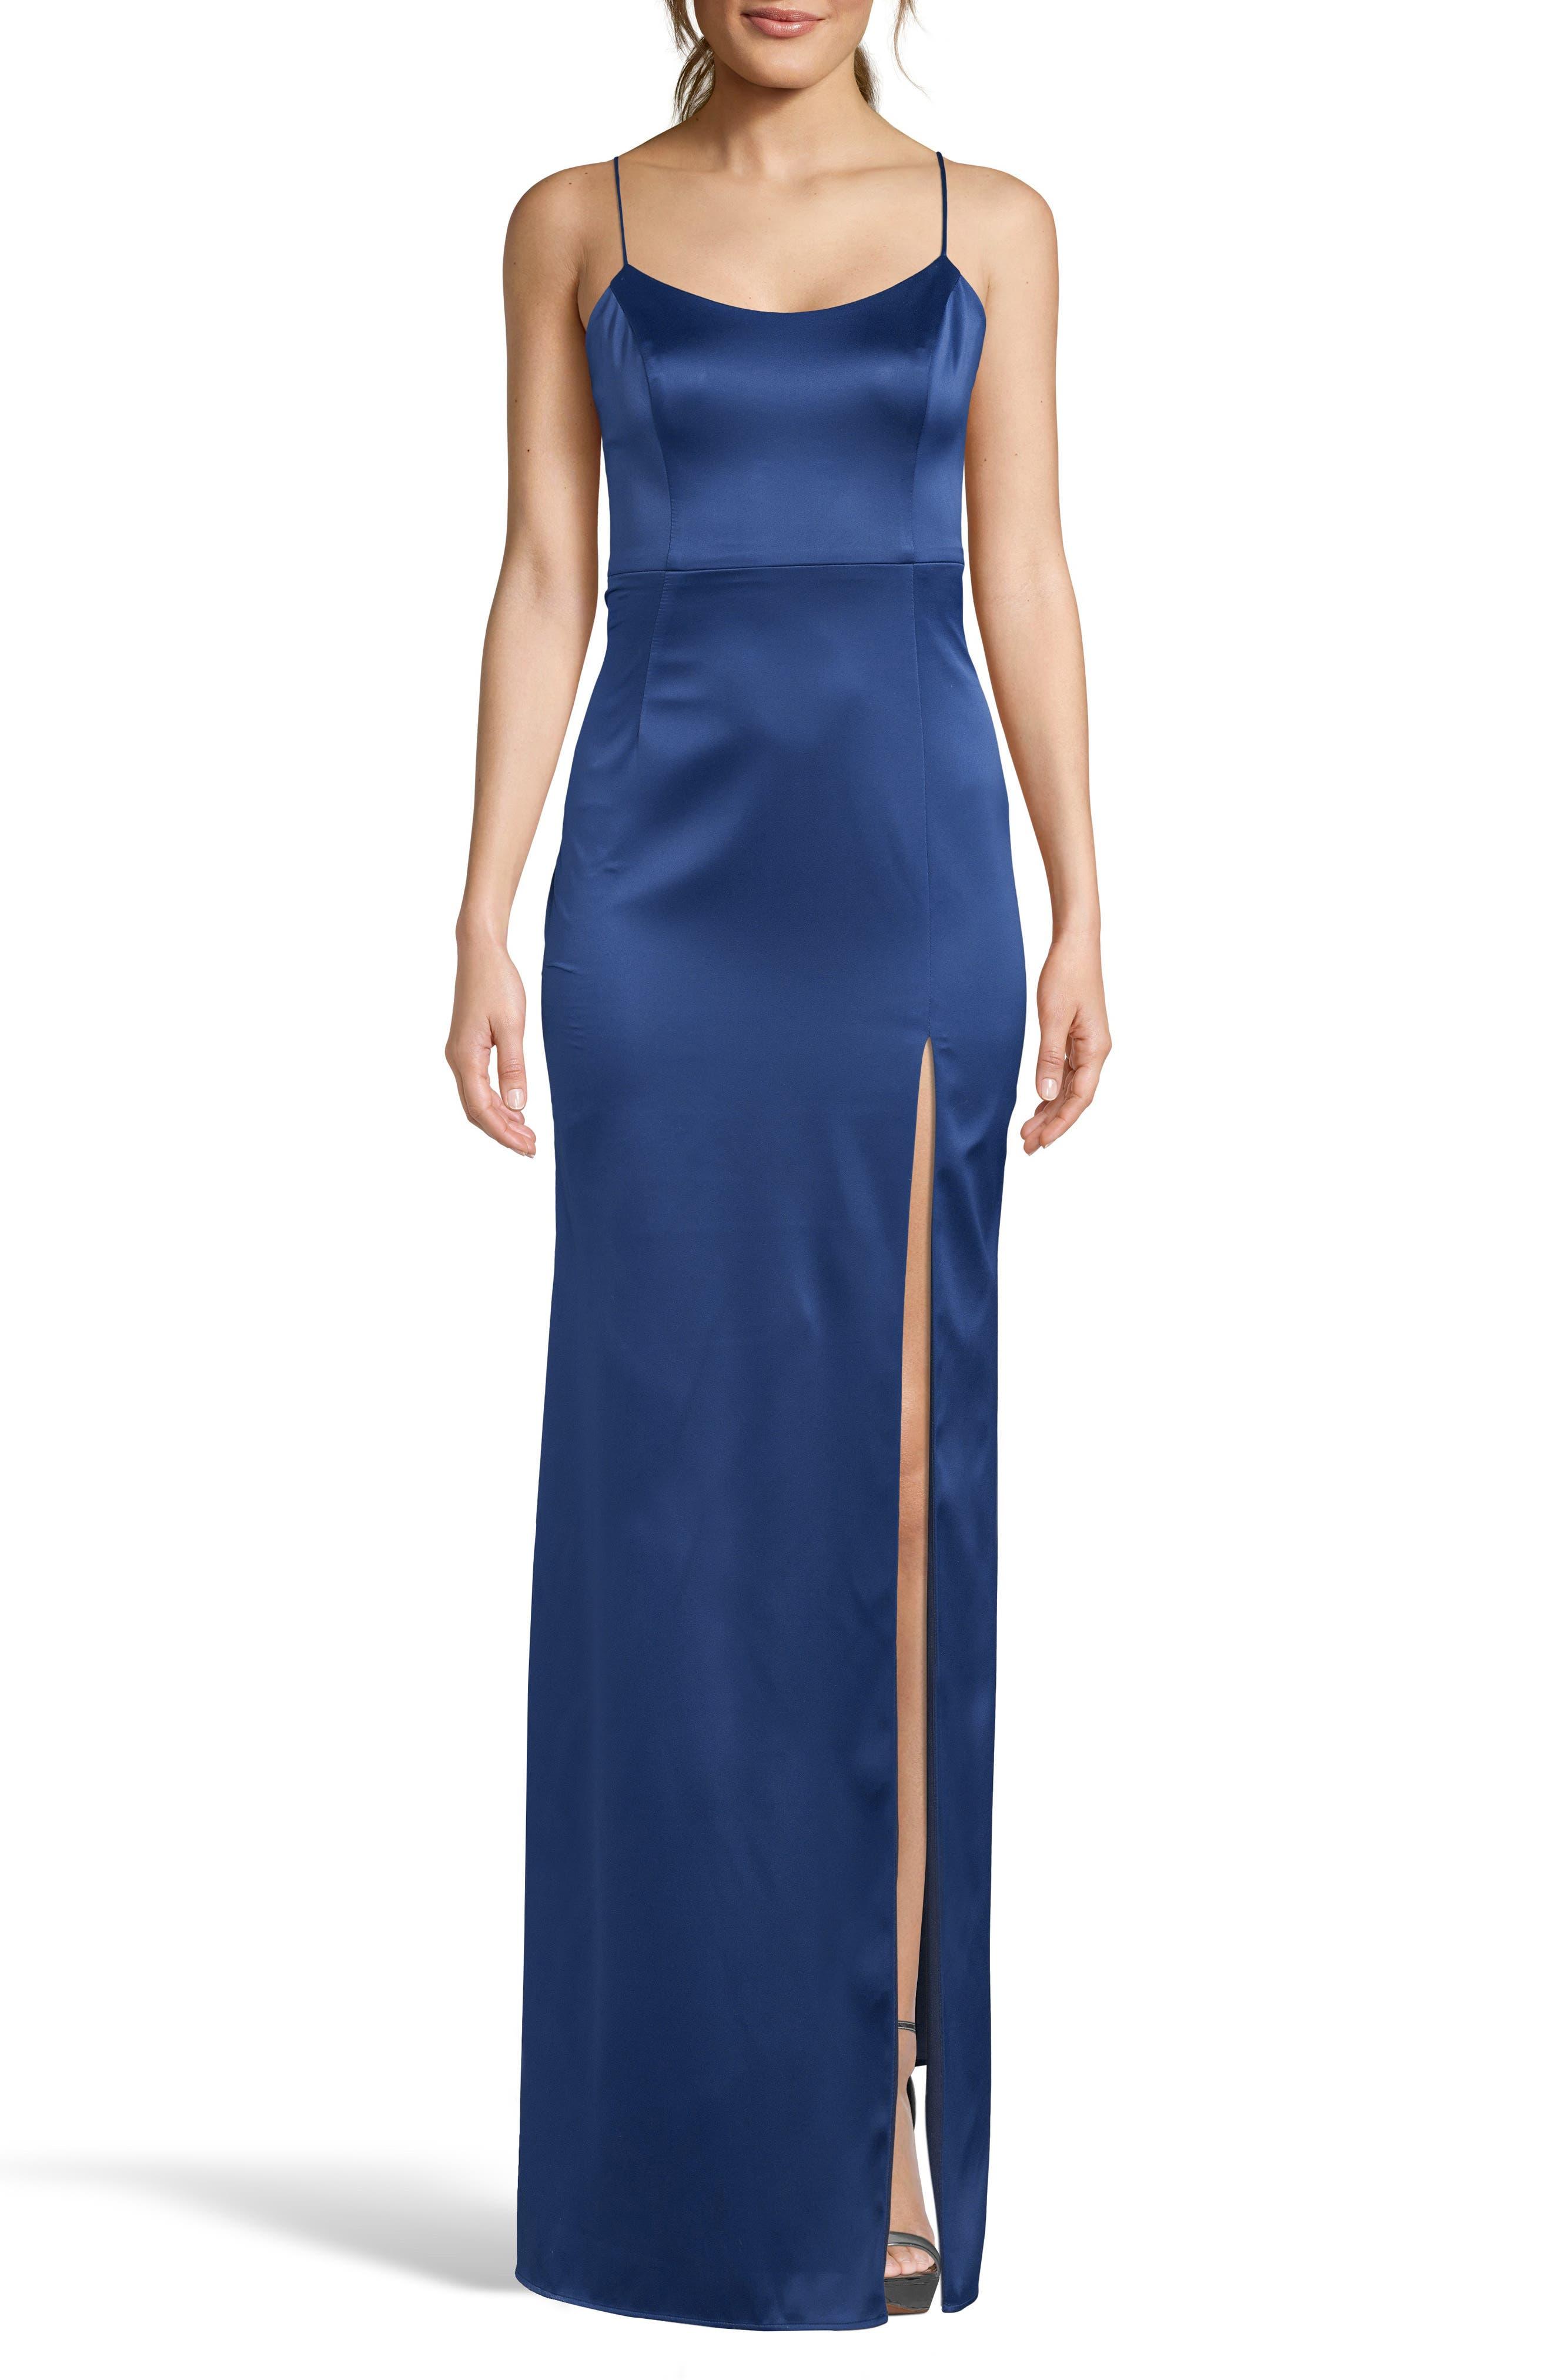 Simple Halter Top Prom Dresses